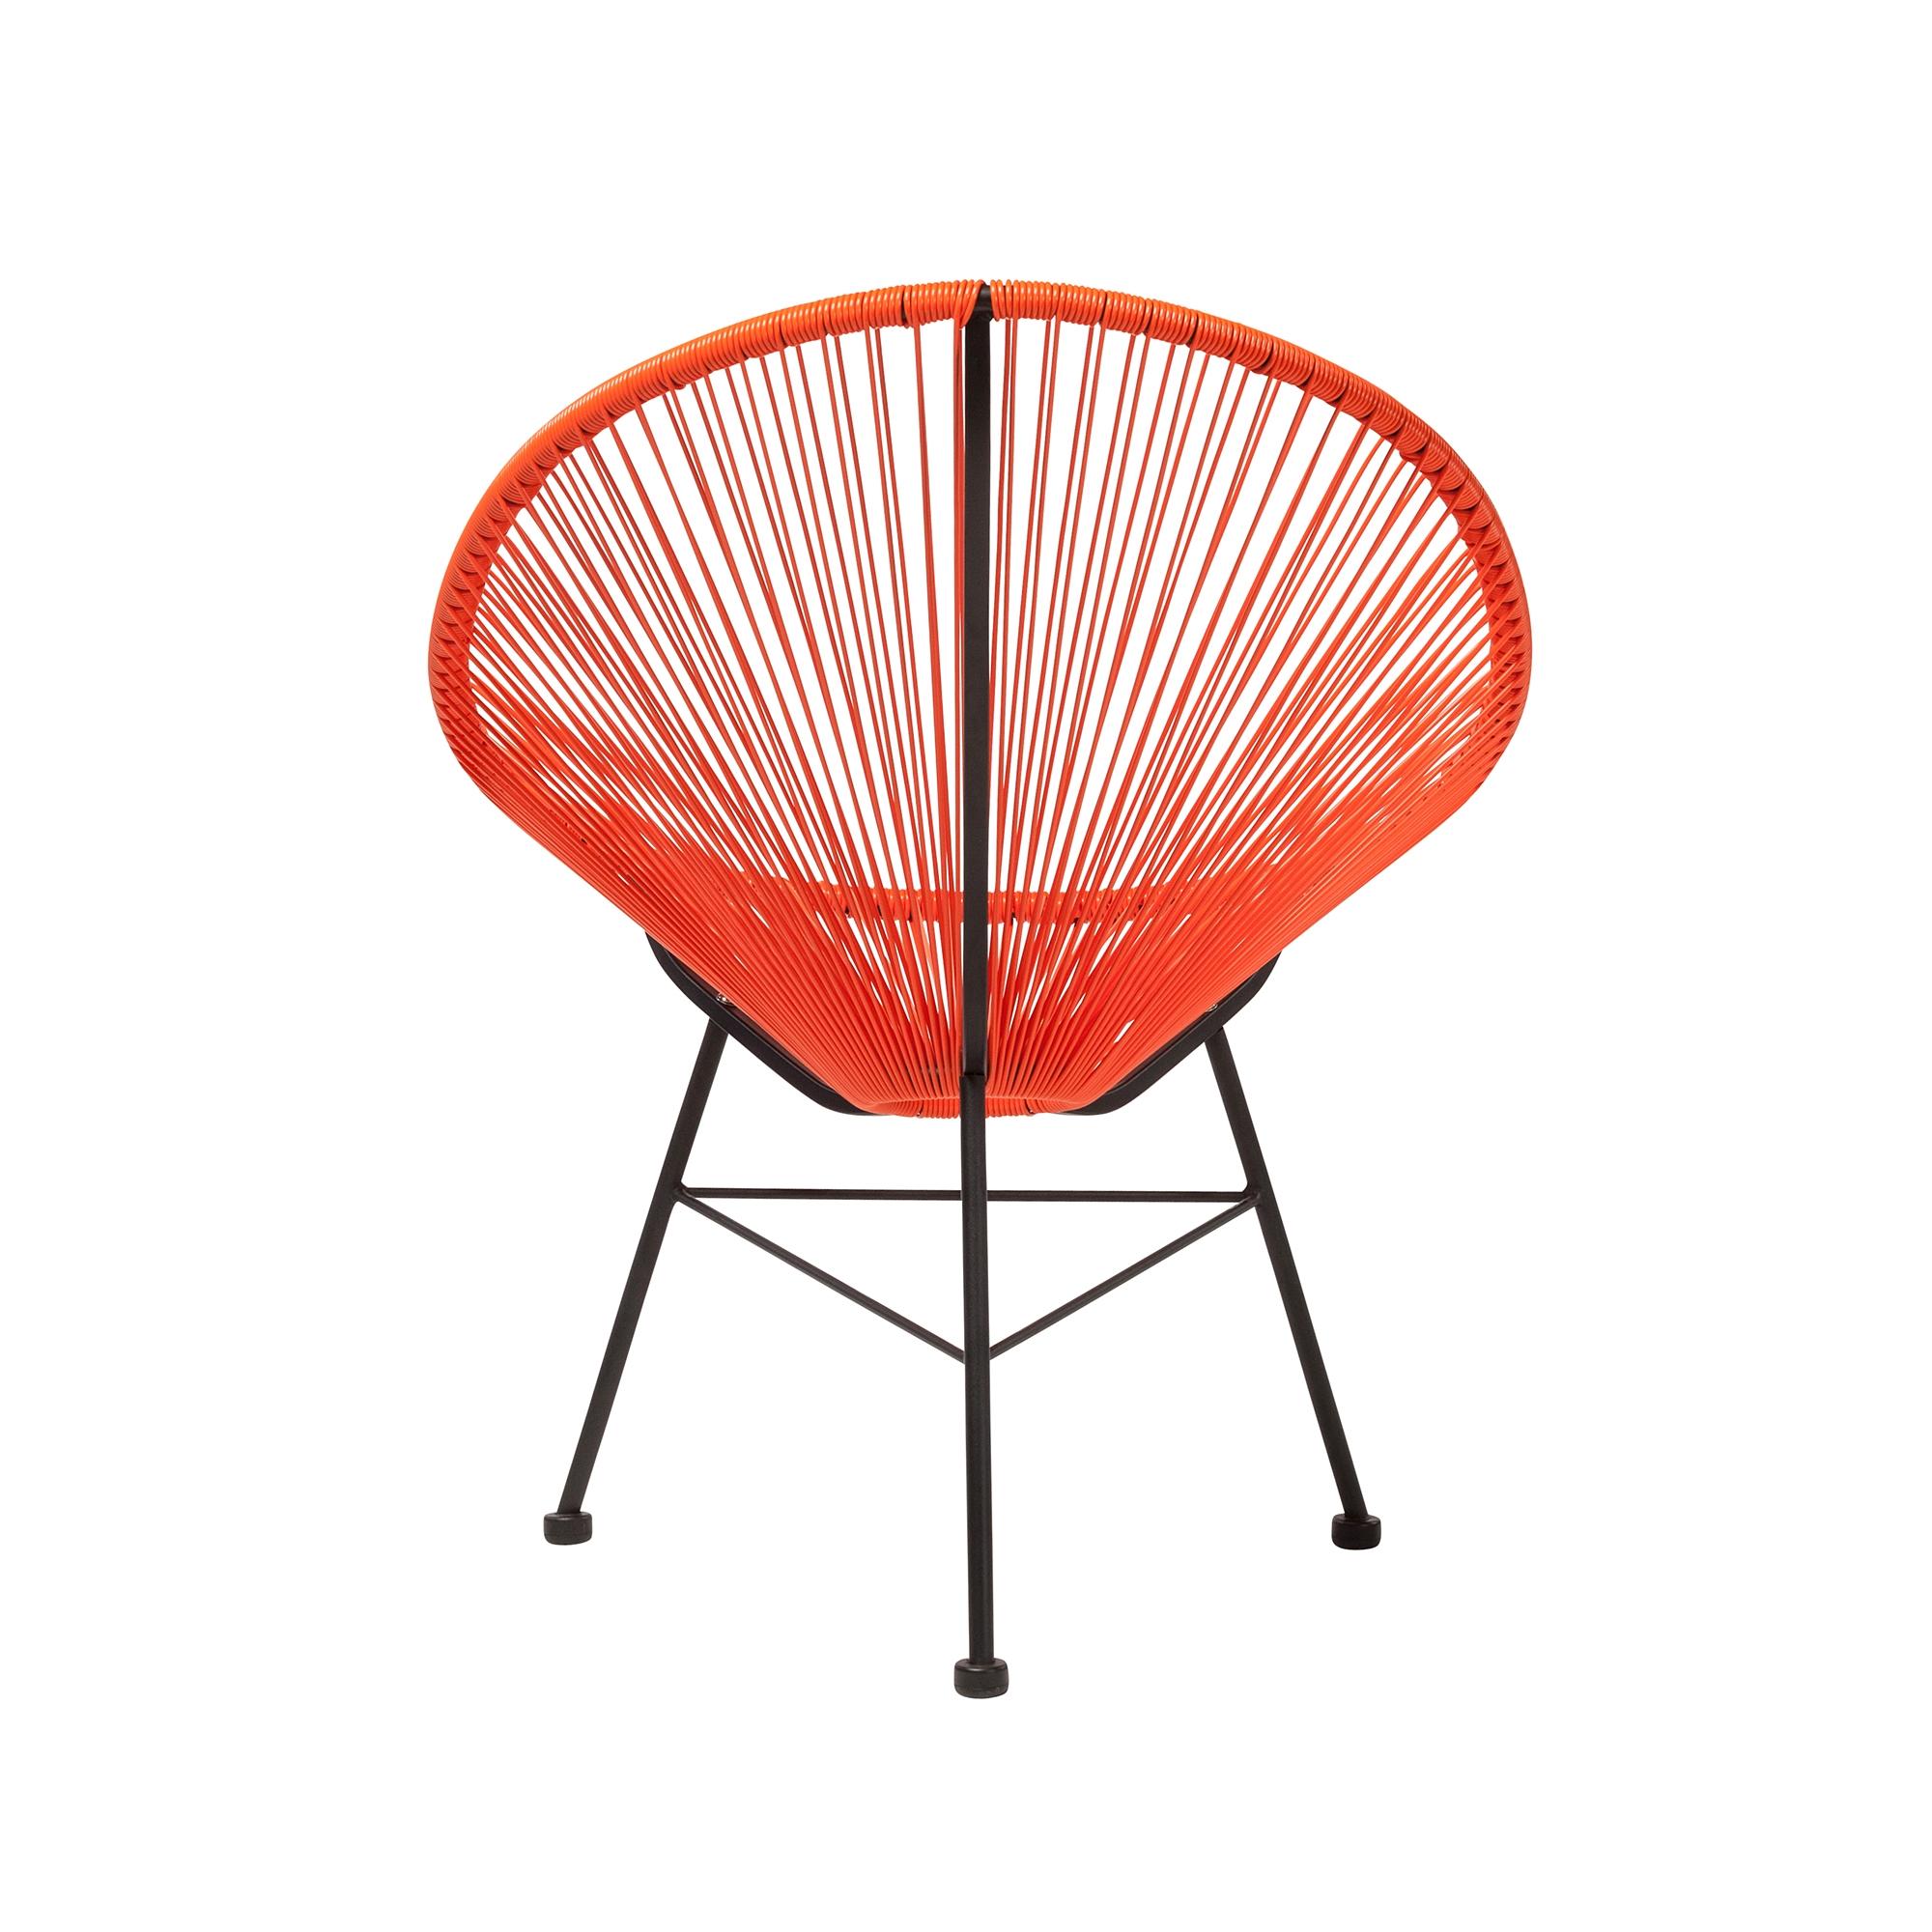 Lounge Stoel Retro.Acapulco Outdoor Lounge Chair Orange The Khazana Home Austin